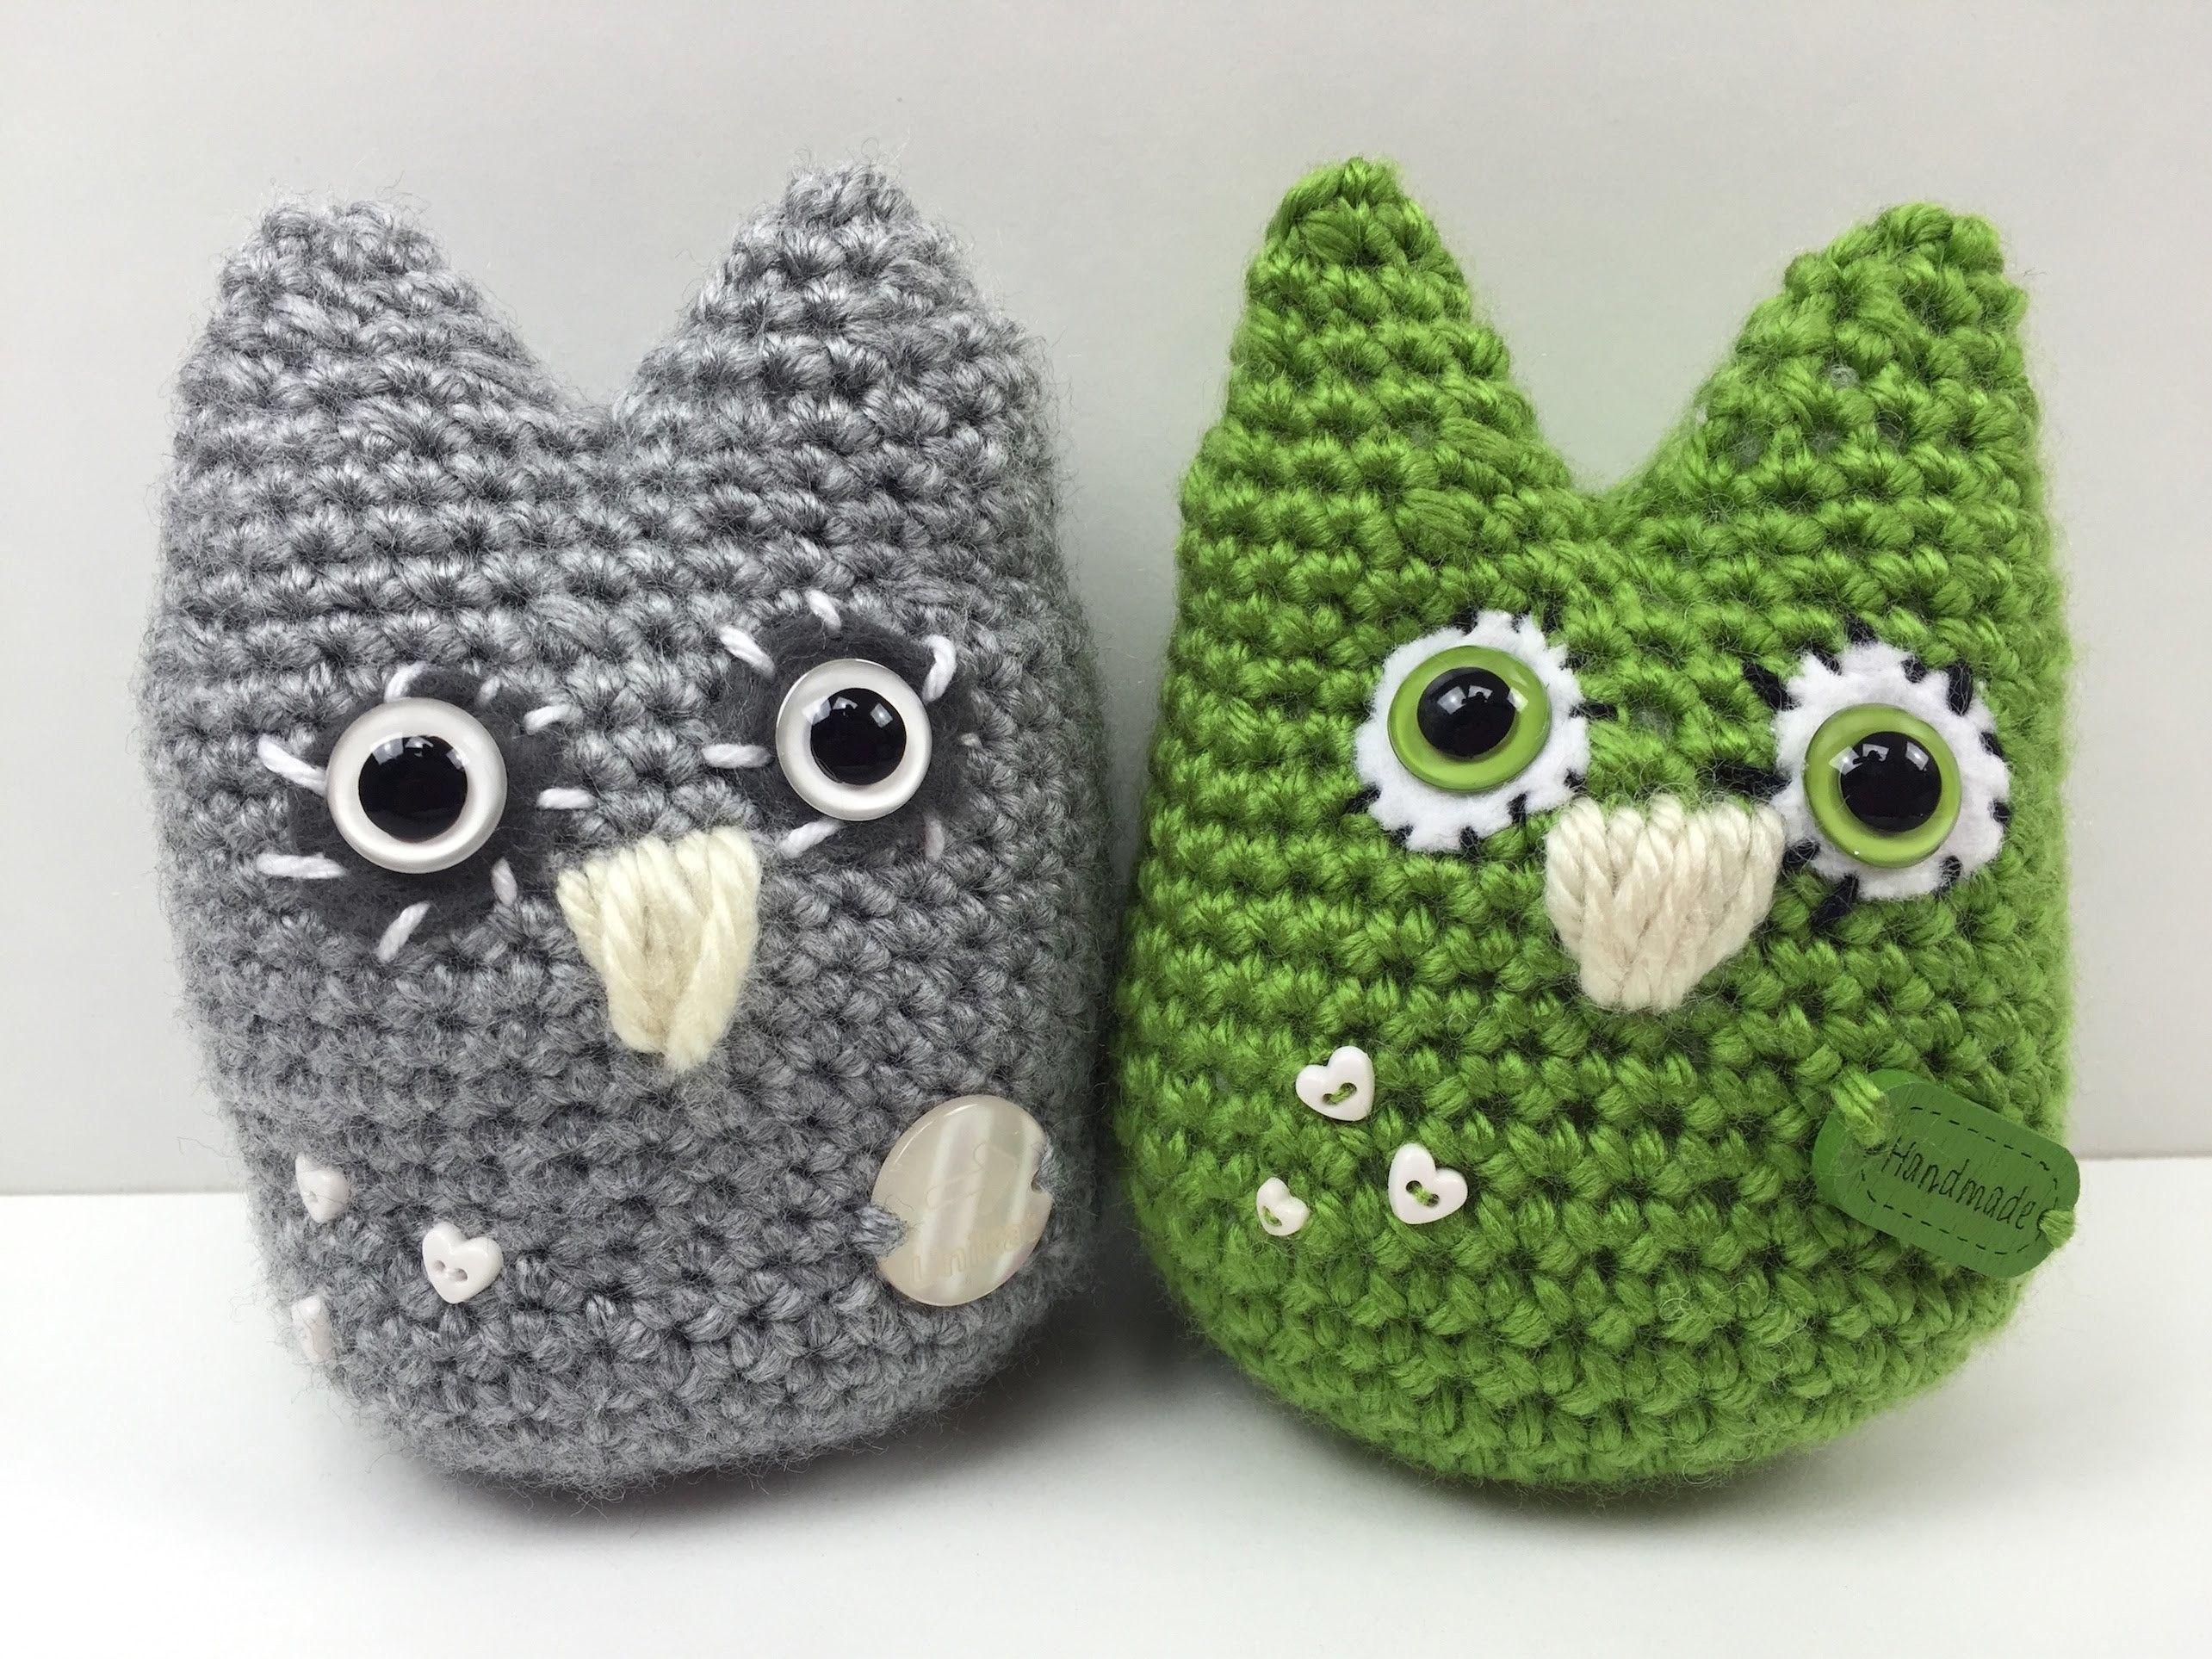 Eule häkeln: schmU-HUsiger UHU - how to crochet an owl | Eule